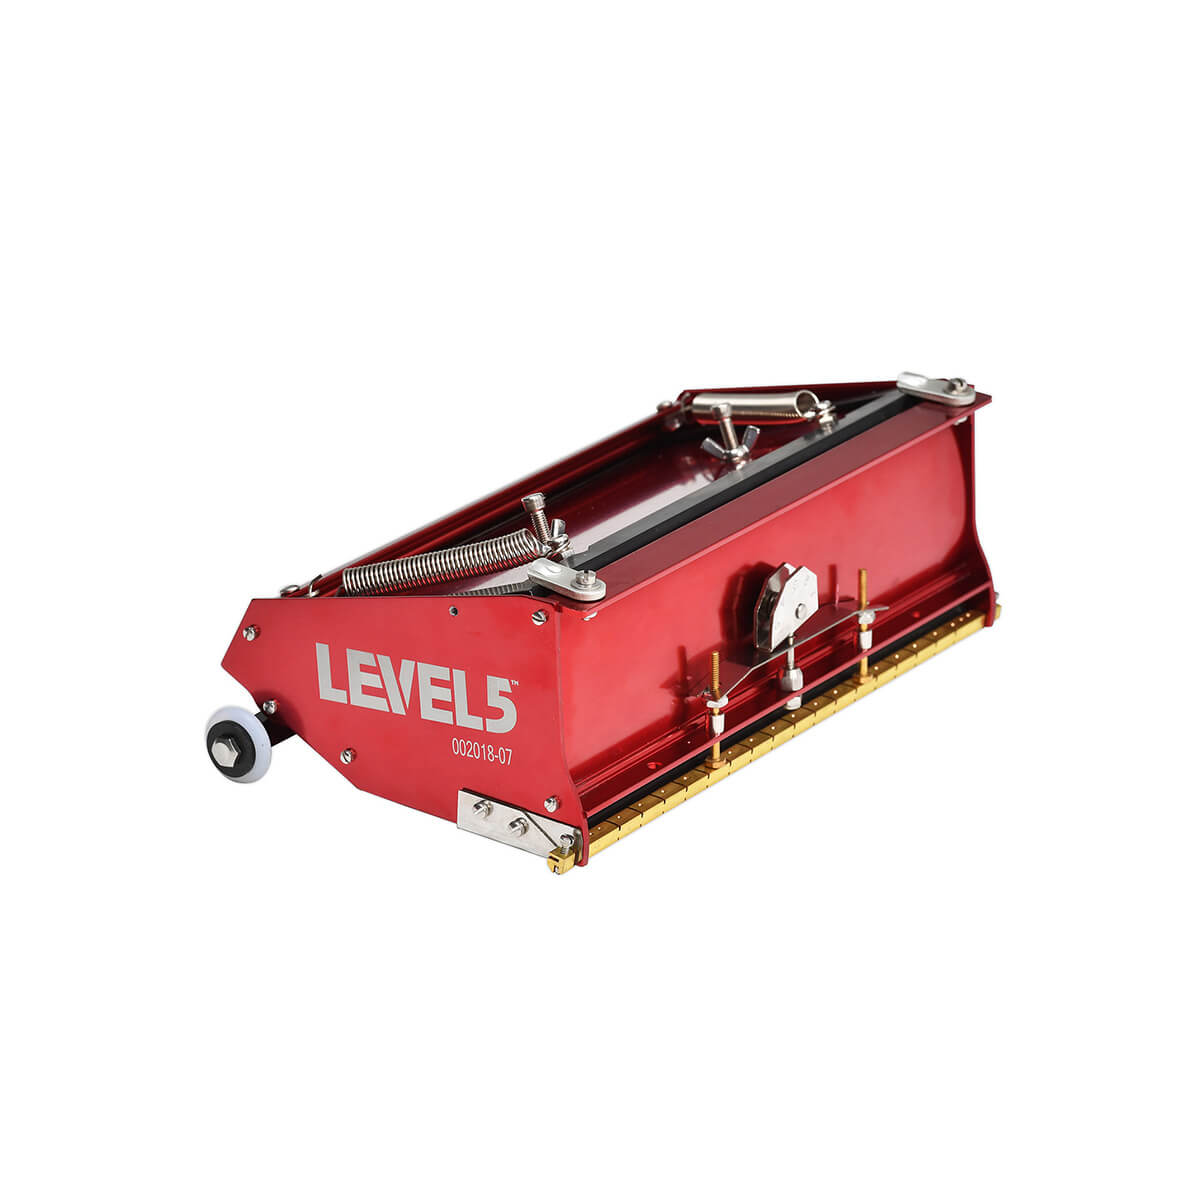 A LEVEL 5 Tools Standard 10-Inch Drywall Flat Box